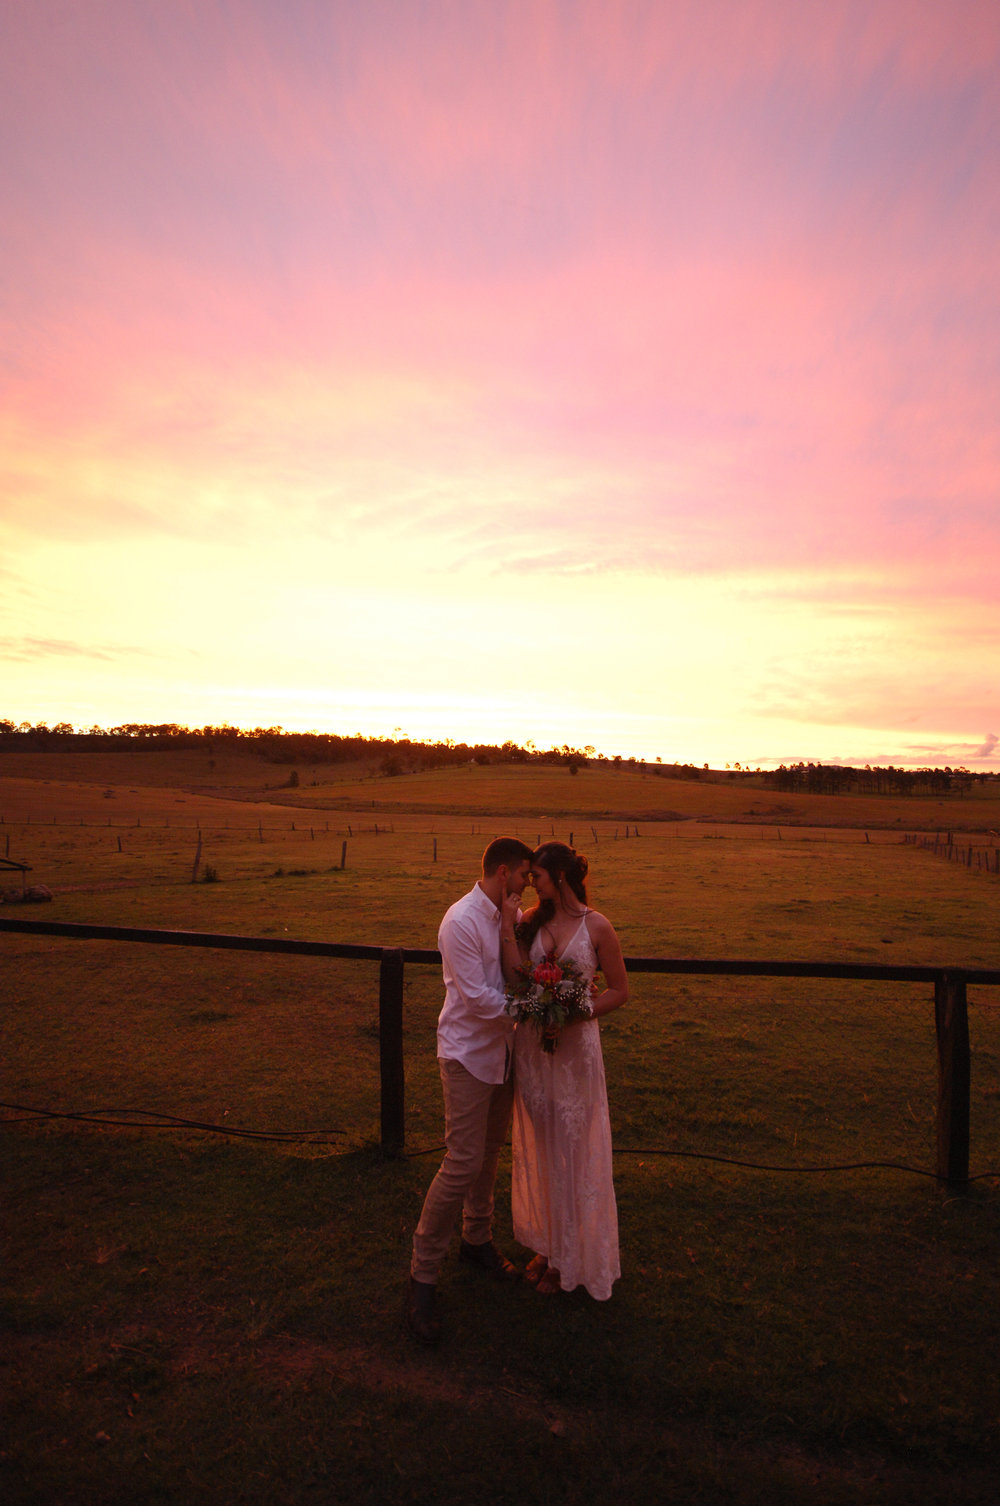 Brisbane Wedding Photographer Lovelenscapes